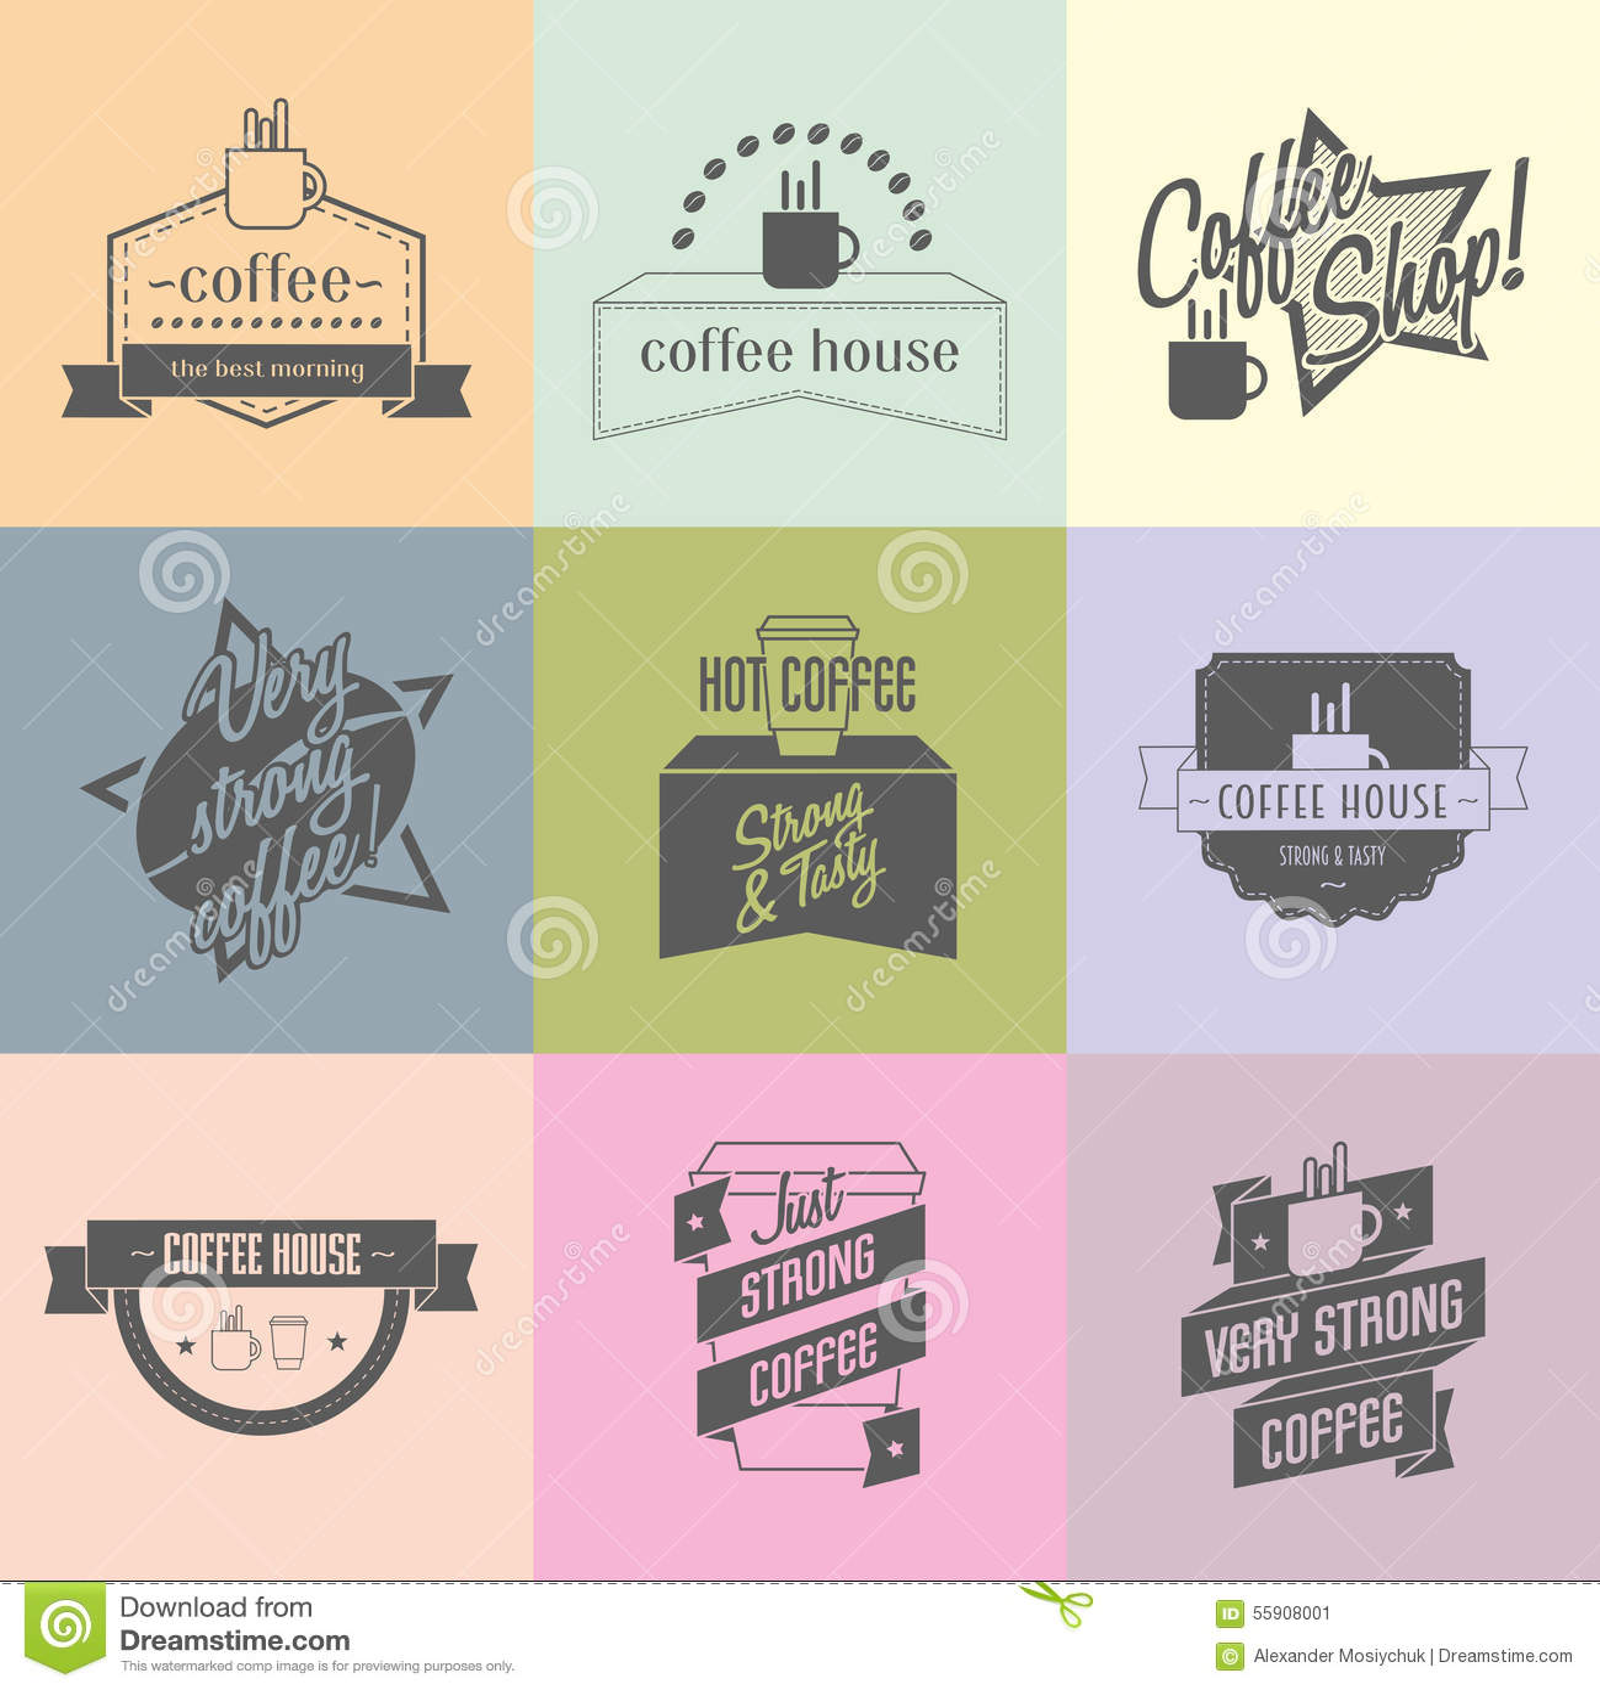 Great Business Card Logo Ideas Contemporary - Business Card Ideas ...